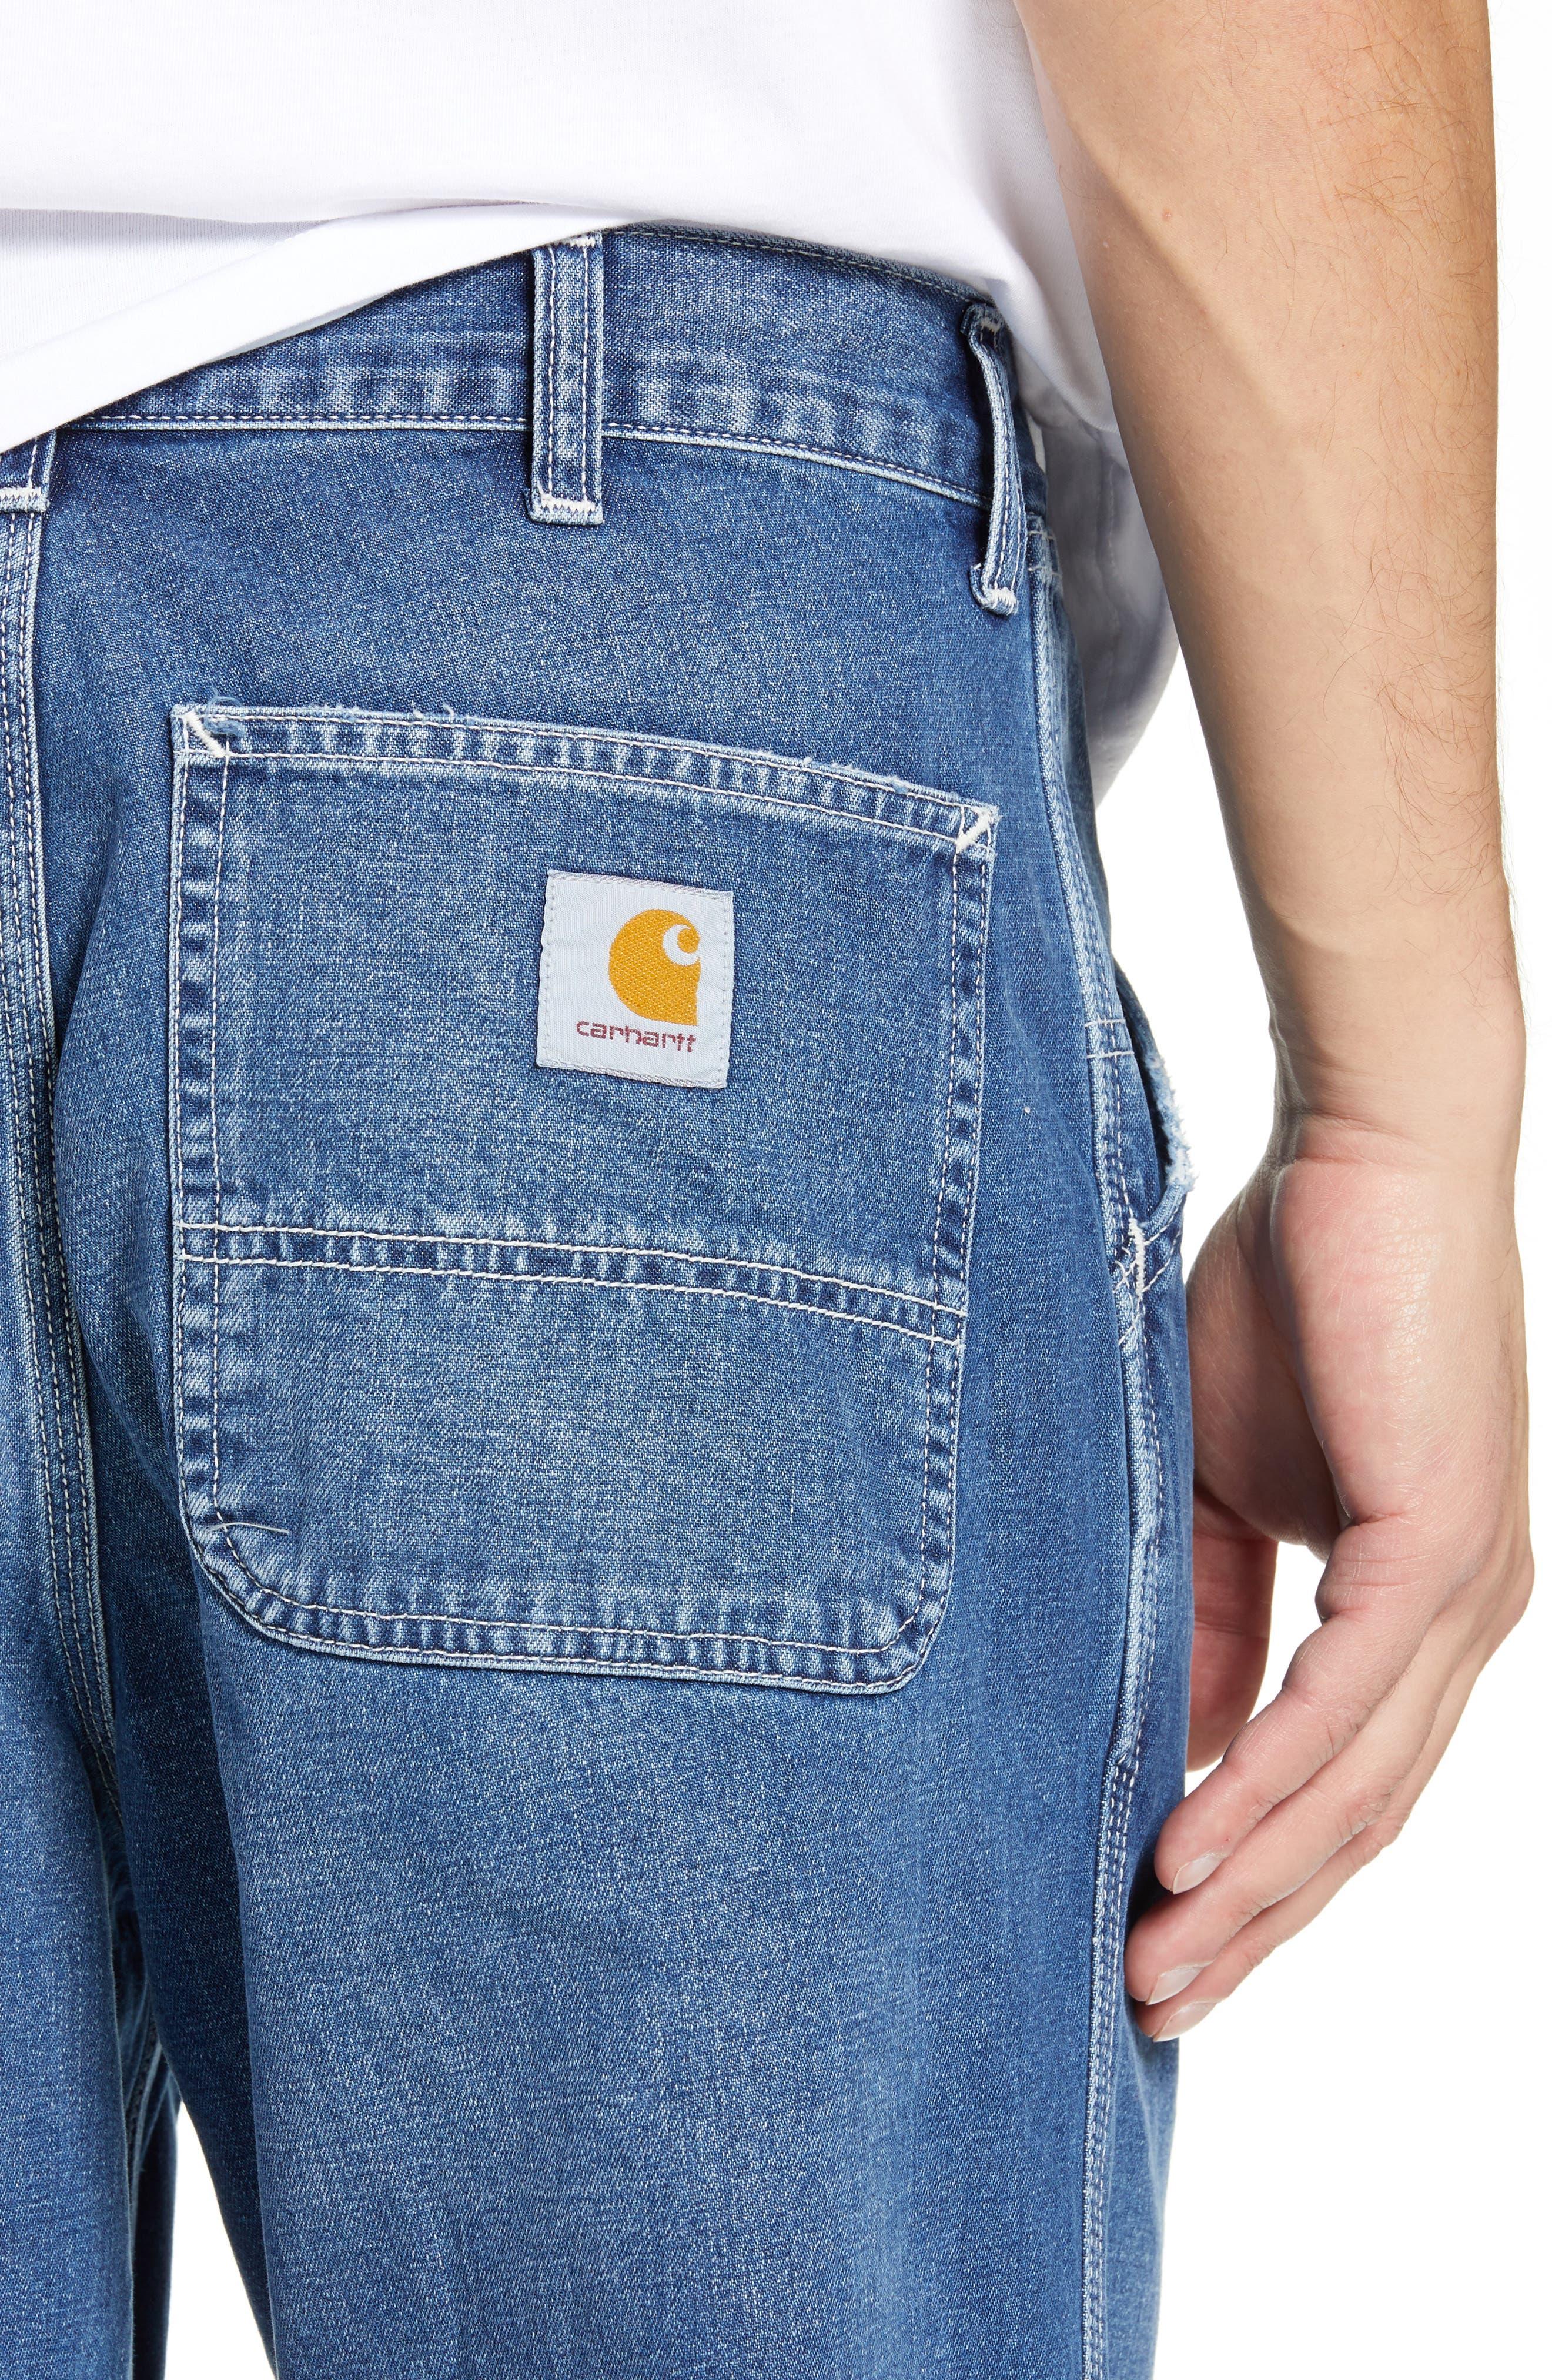 CARHARTT WORK IN PROGRESS,                             Simple Denim Jeans,                             Alternate thumbnail 4, color,                             BLUE